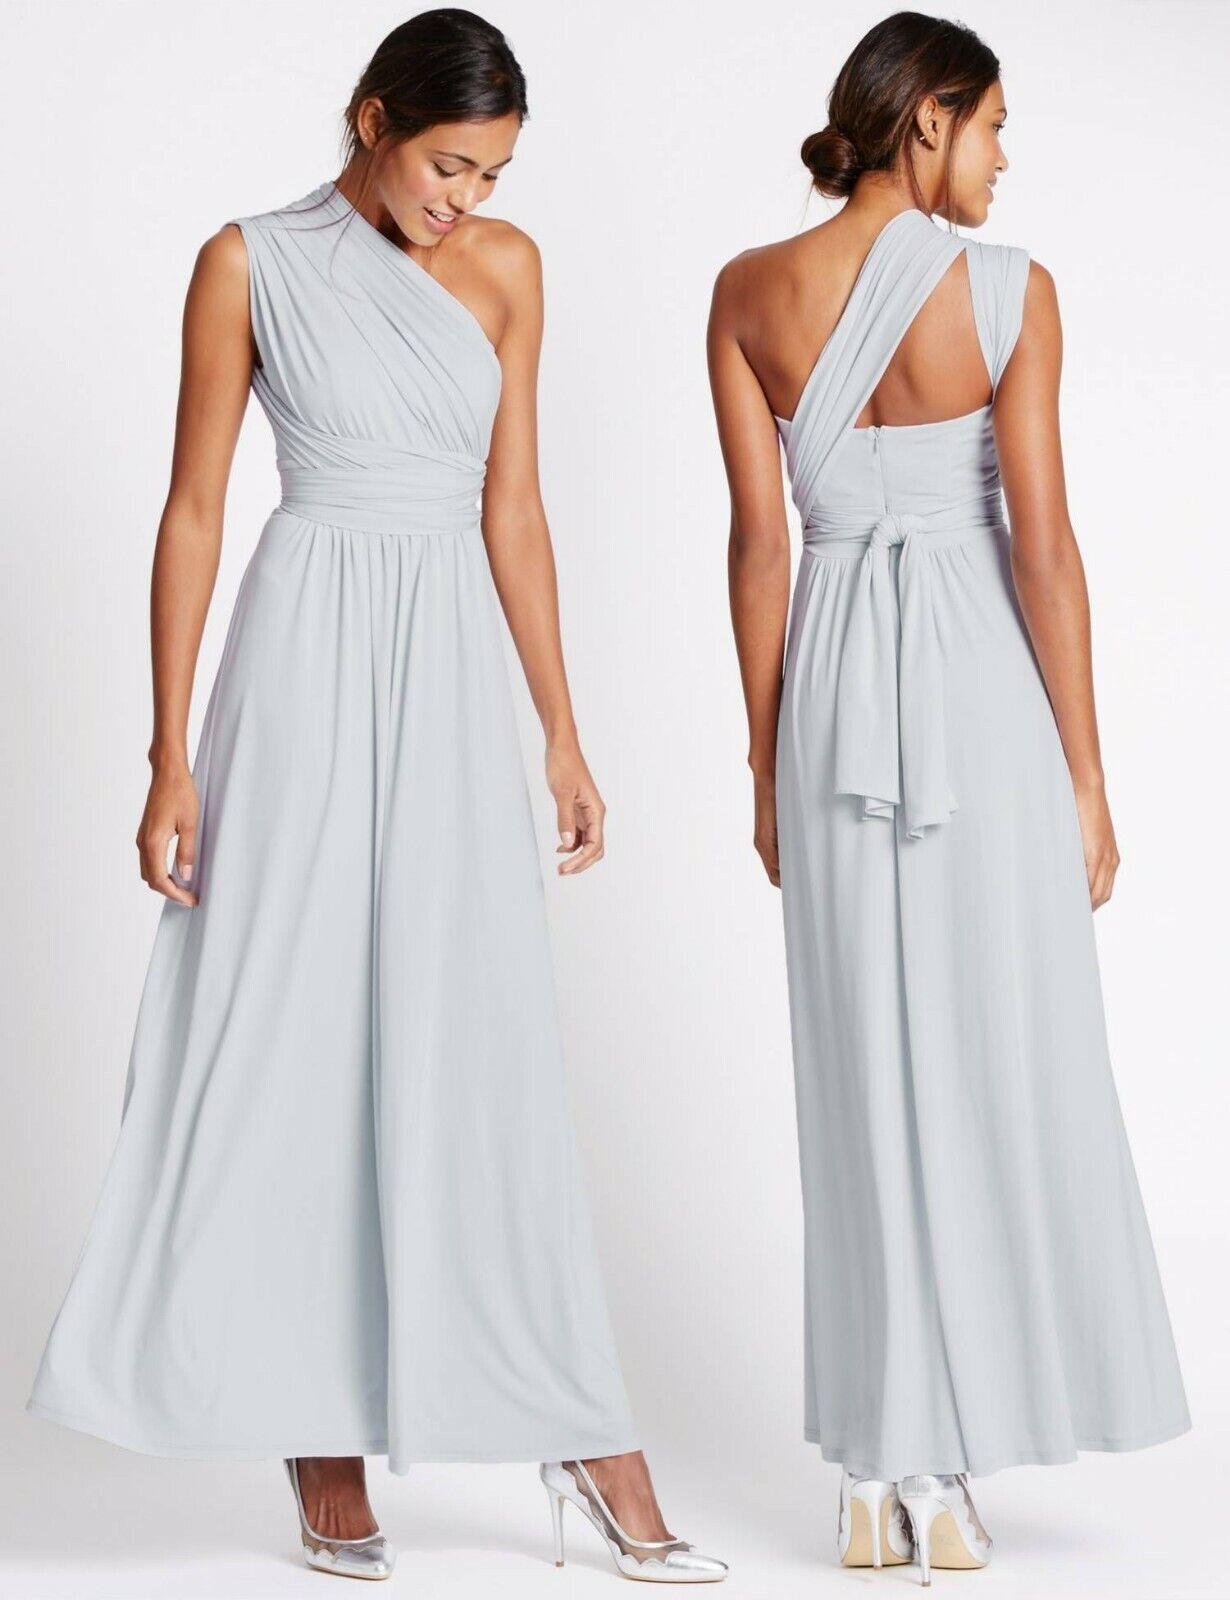 marks and spencer multiway dress